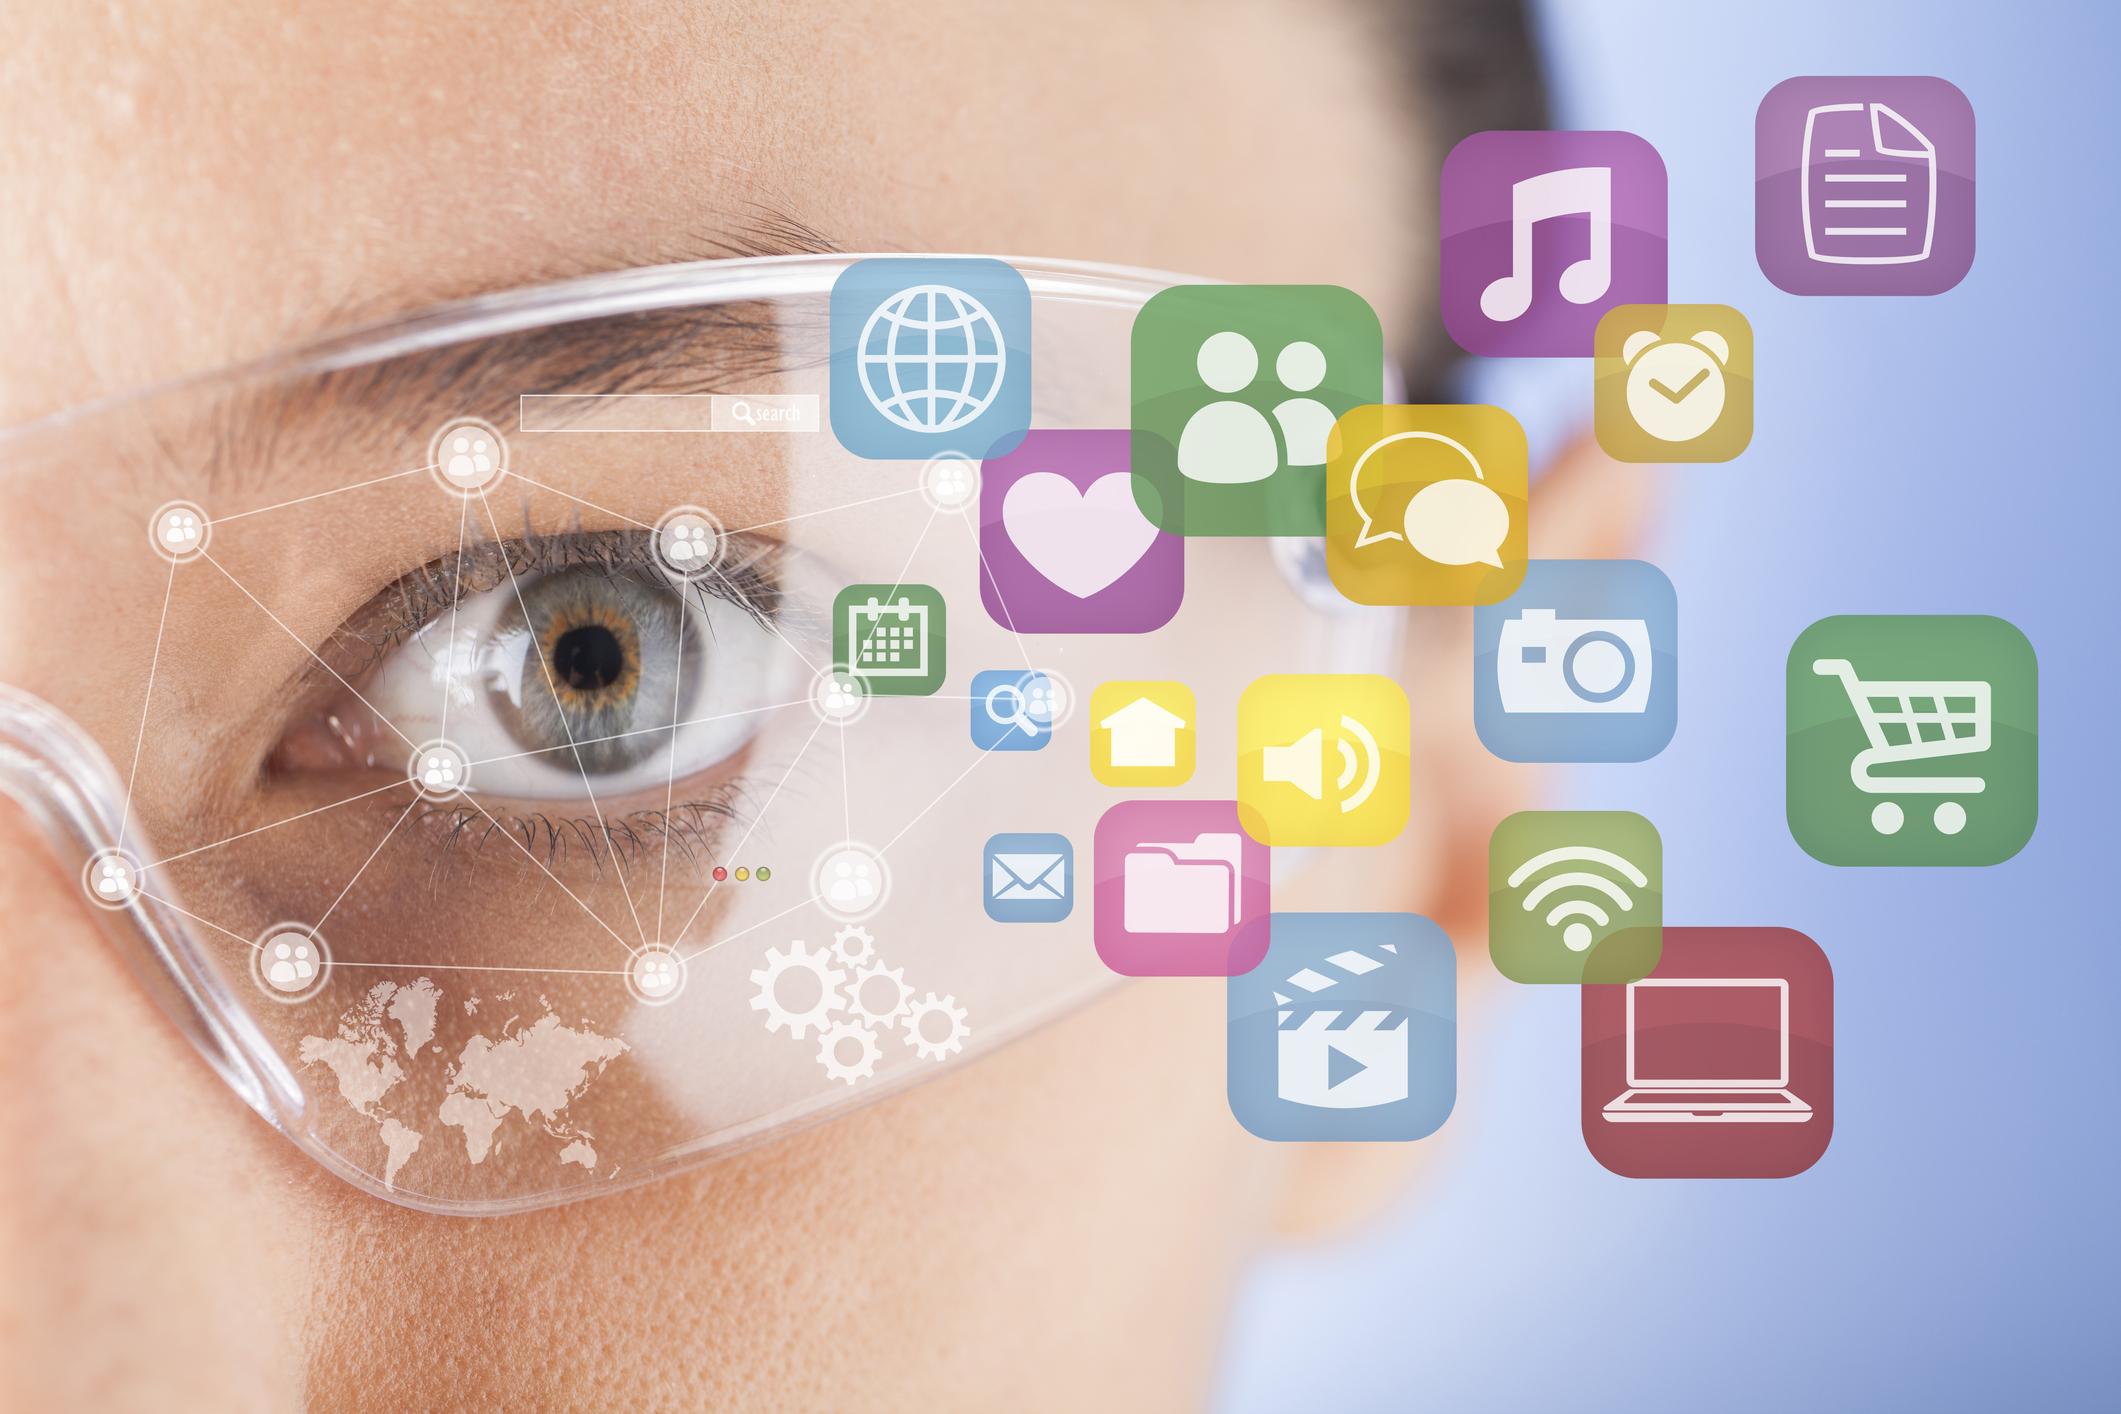 Concept of smart AR glasses